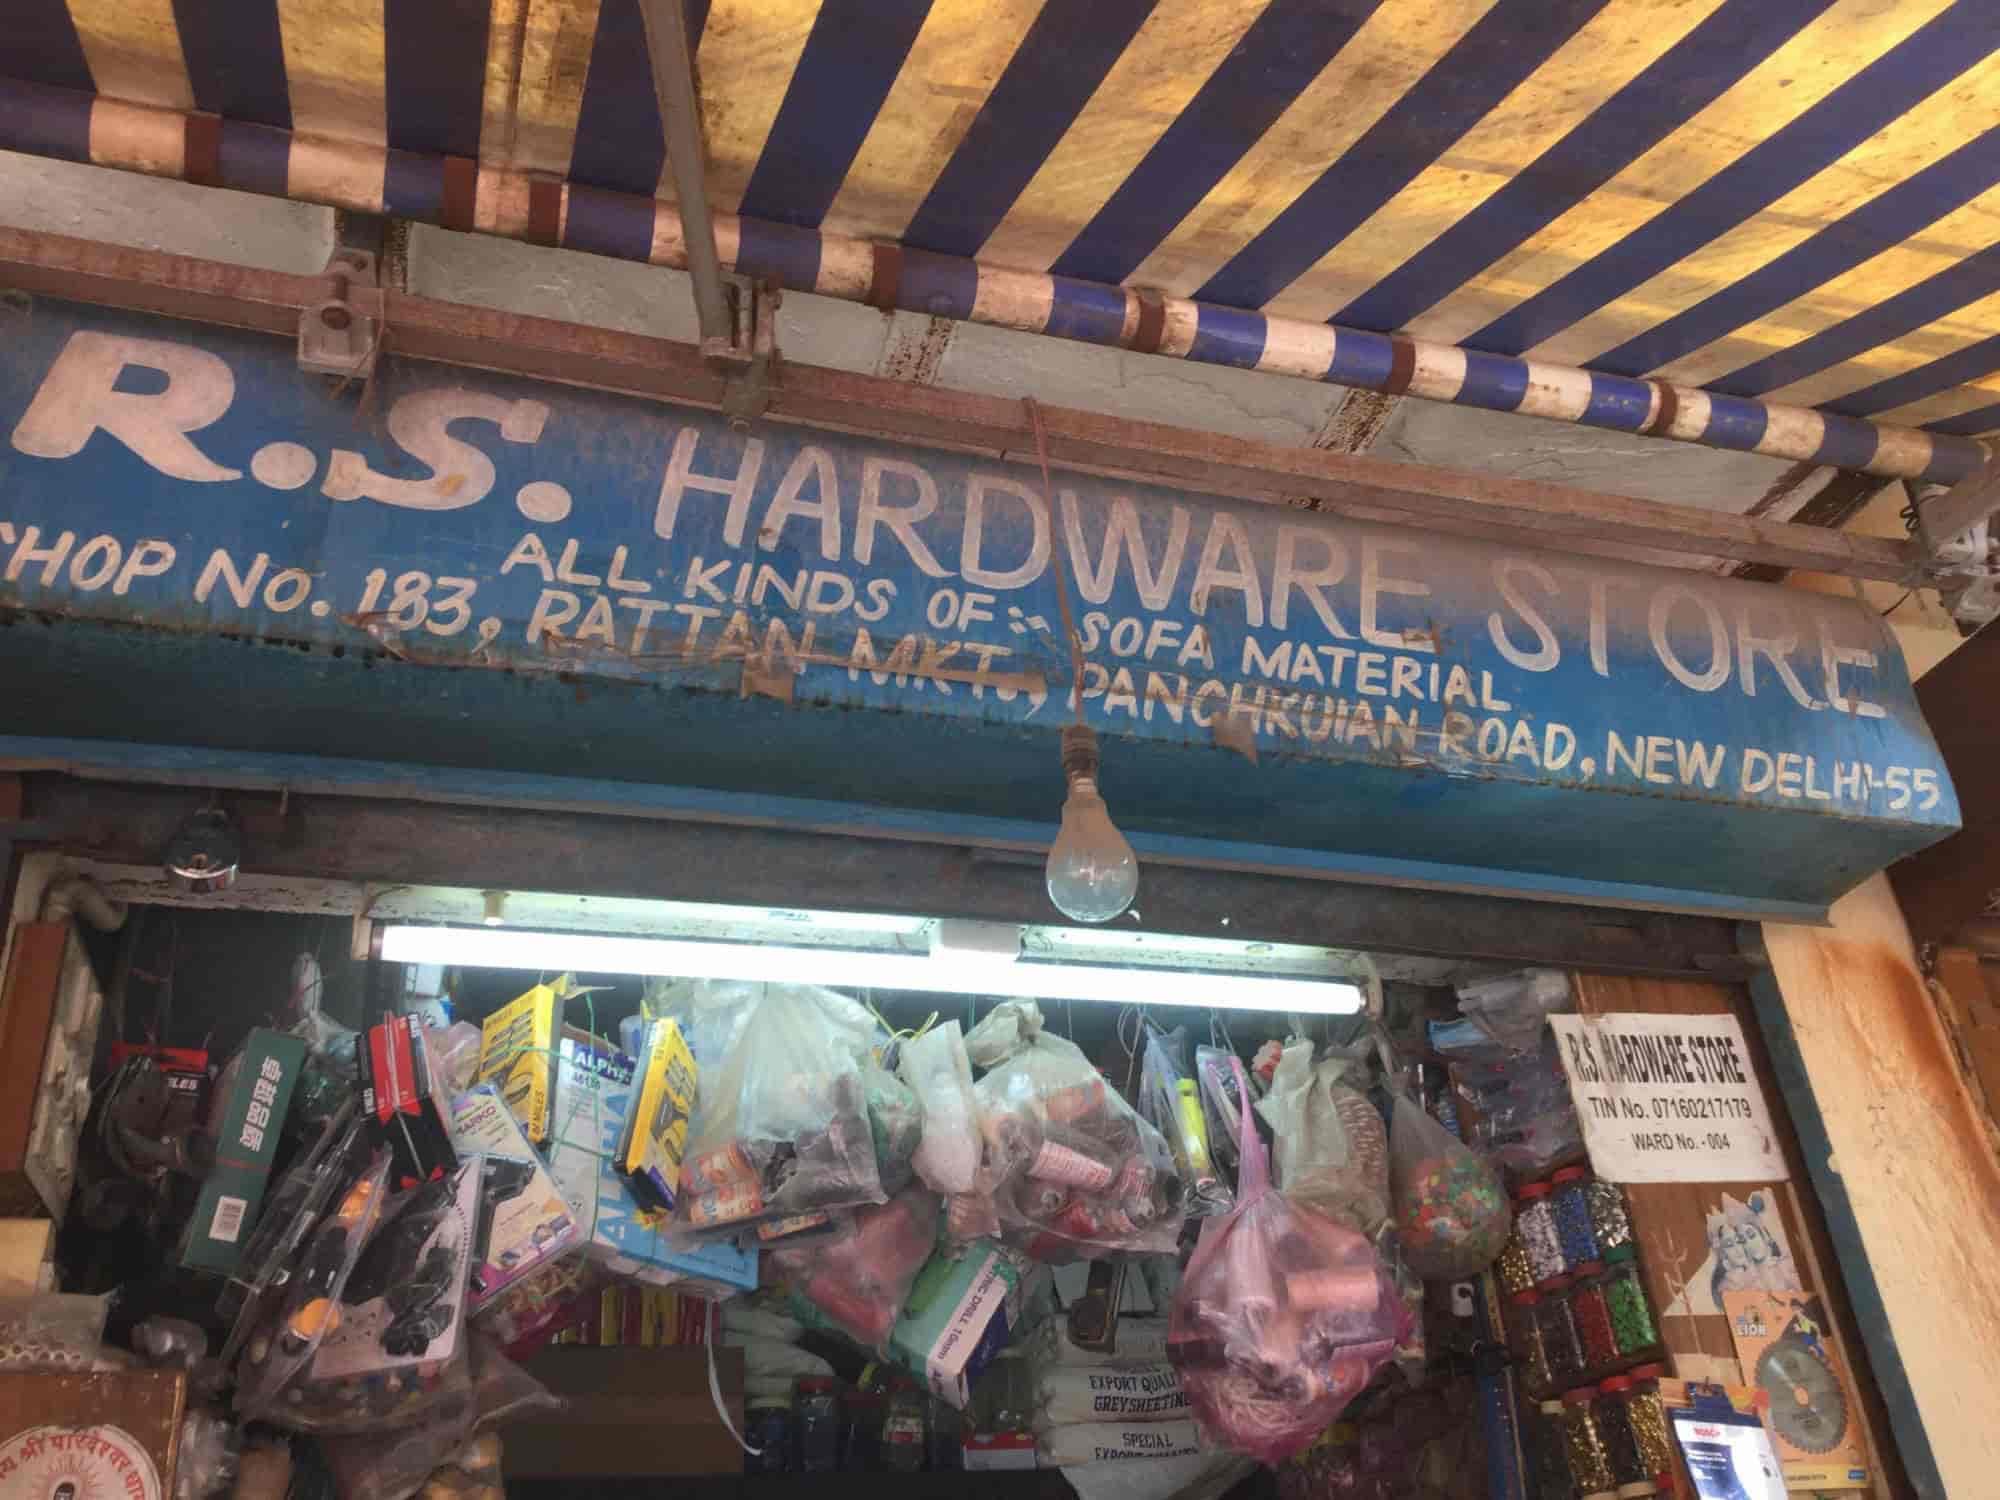 R s hardware Store Panchkuian Road Carpenters in Delhi Justdial